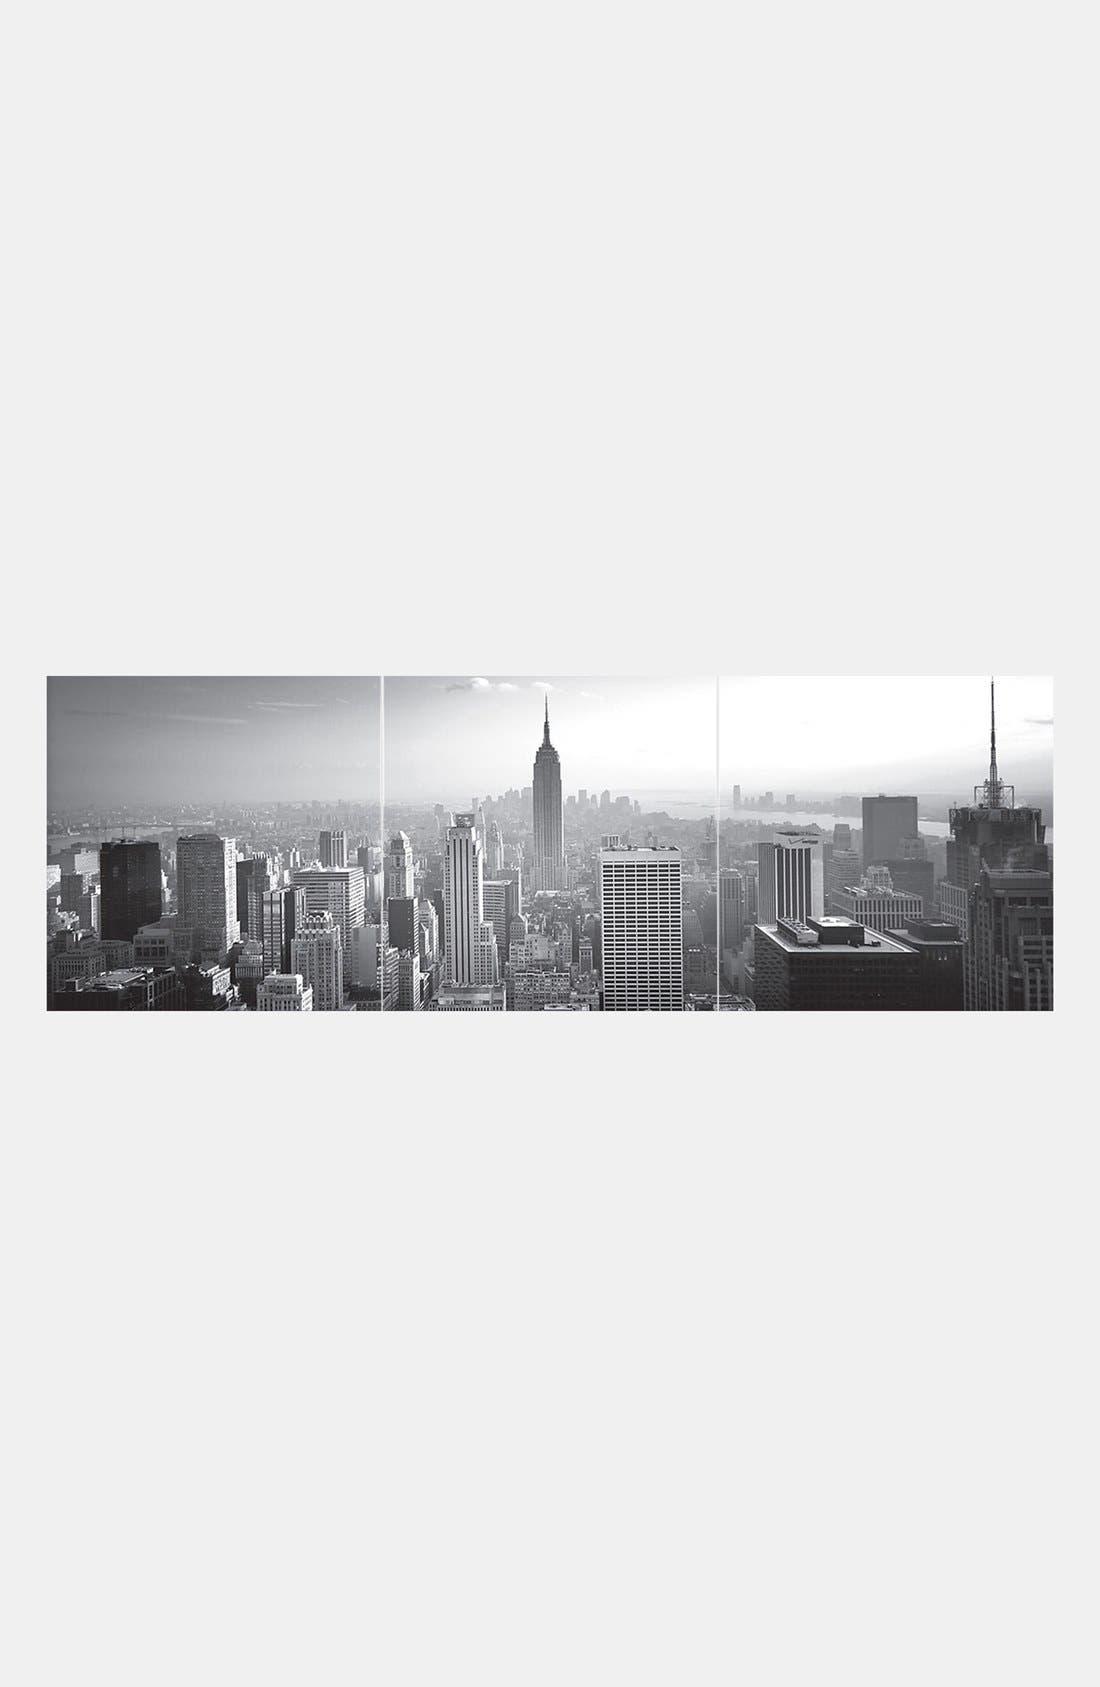 Alternate Image 1 Selected - Wallpops New York Print Wall Art